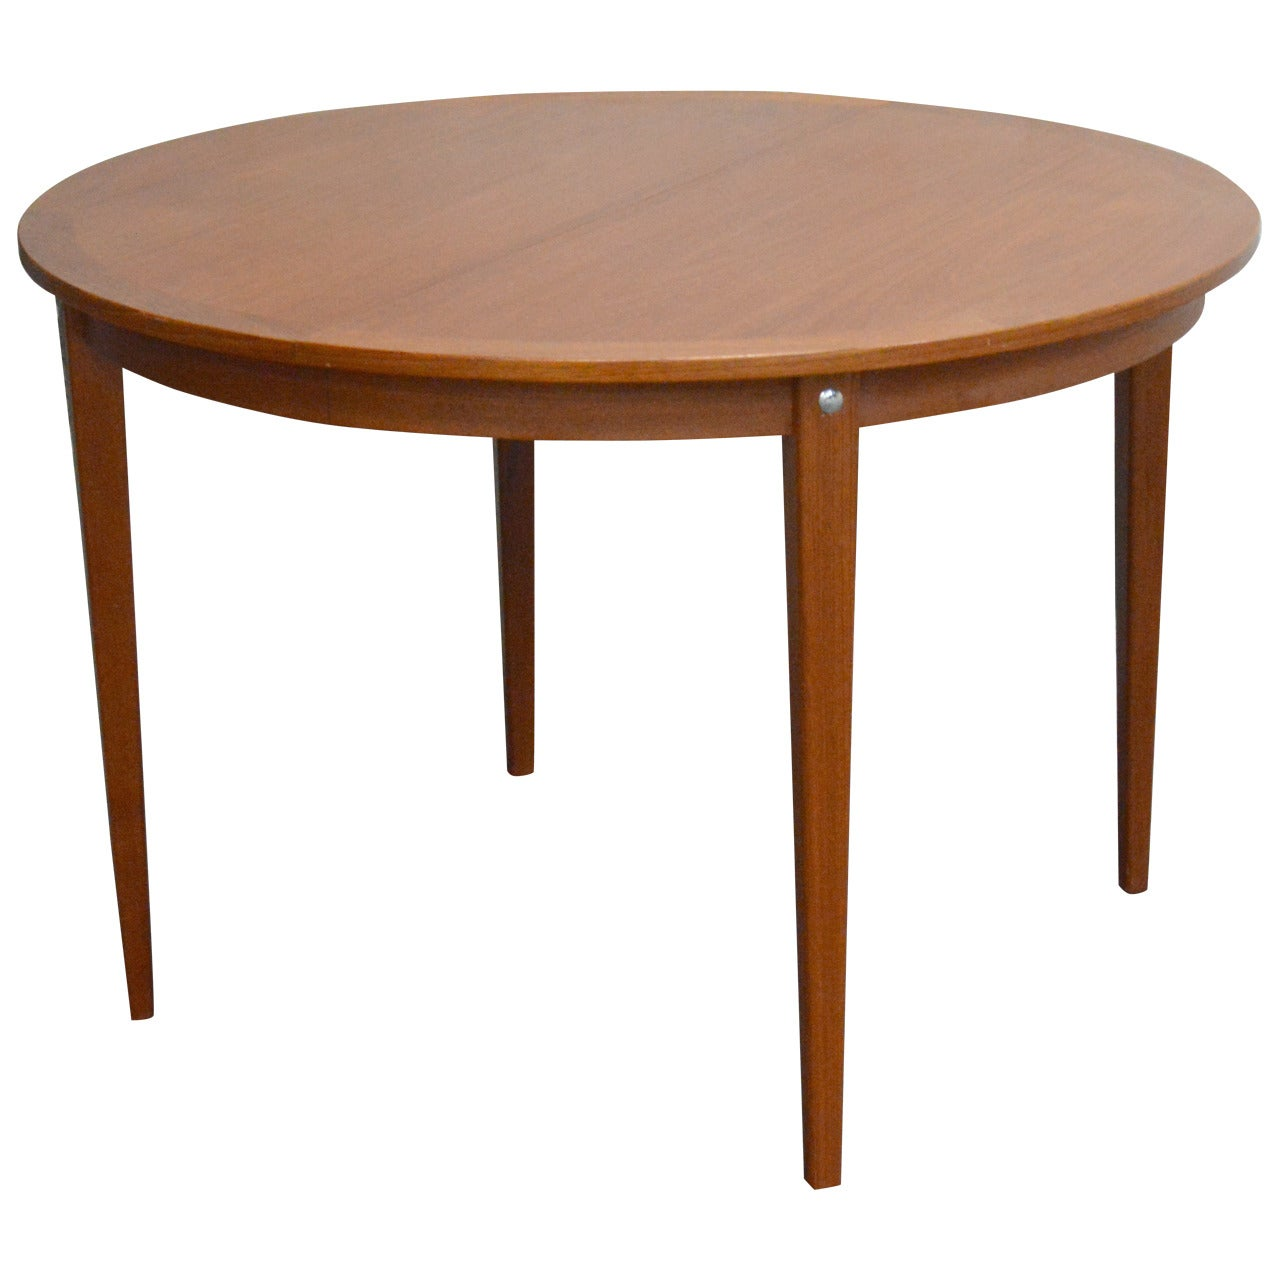 Mid-Century Modern Round Swedish Teak Dining Table